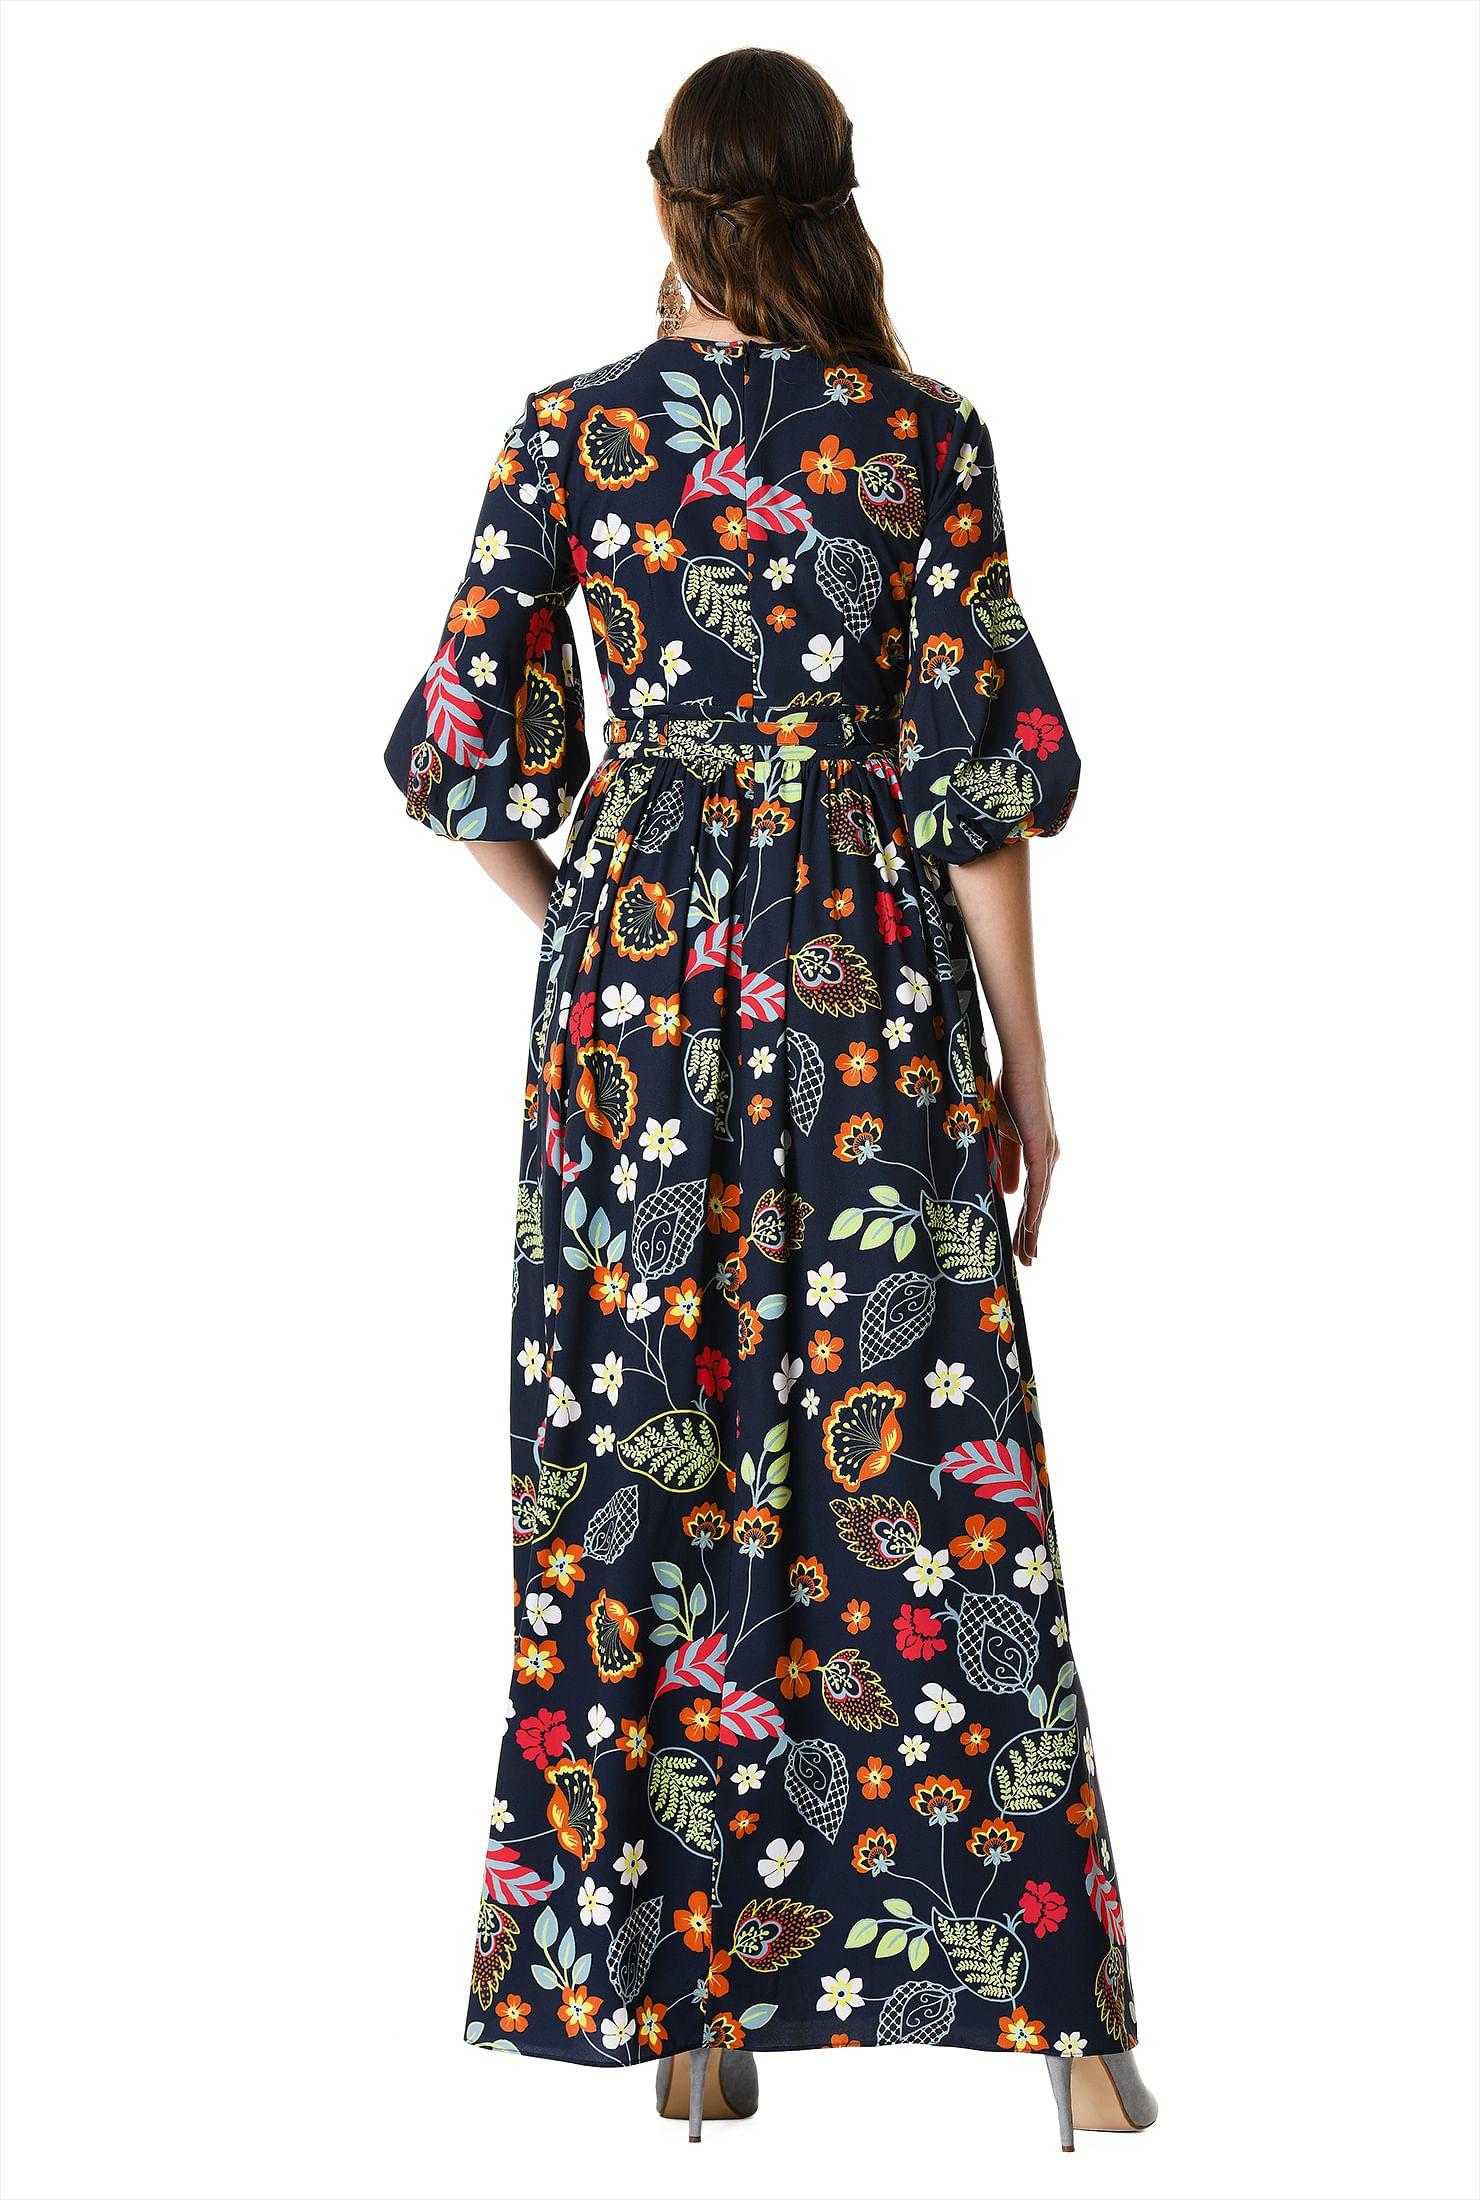 dcb3daaafd2e Fun floral print tassel tie crepe maxi dress